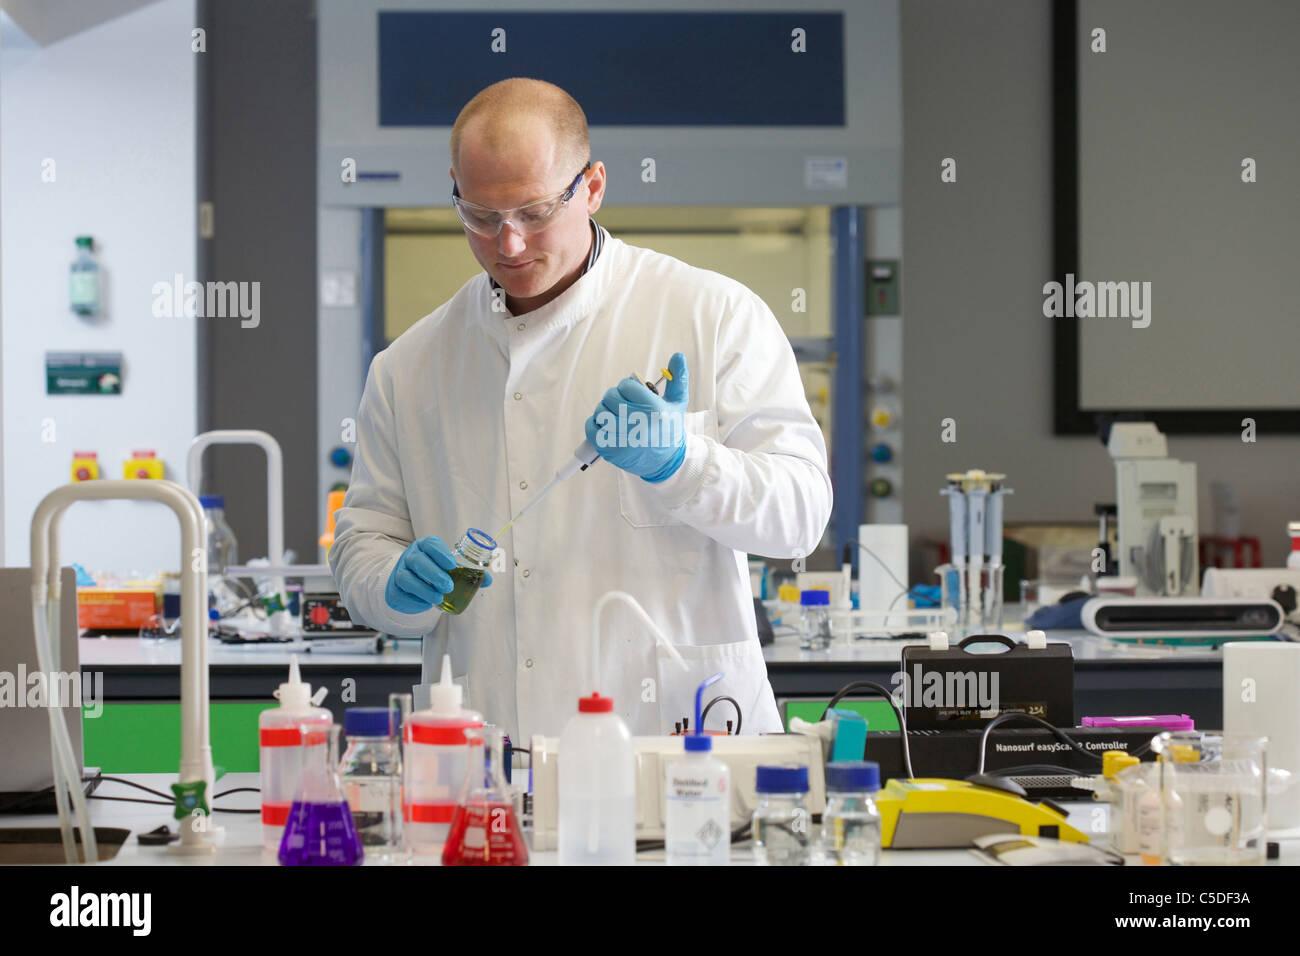 Wednesday 6th July 2011 Lab technician chemical testing at the Leeds Metropolitan University.Bio Chemistry Laboratories. - Stock Image